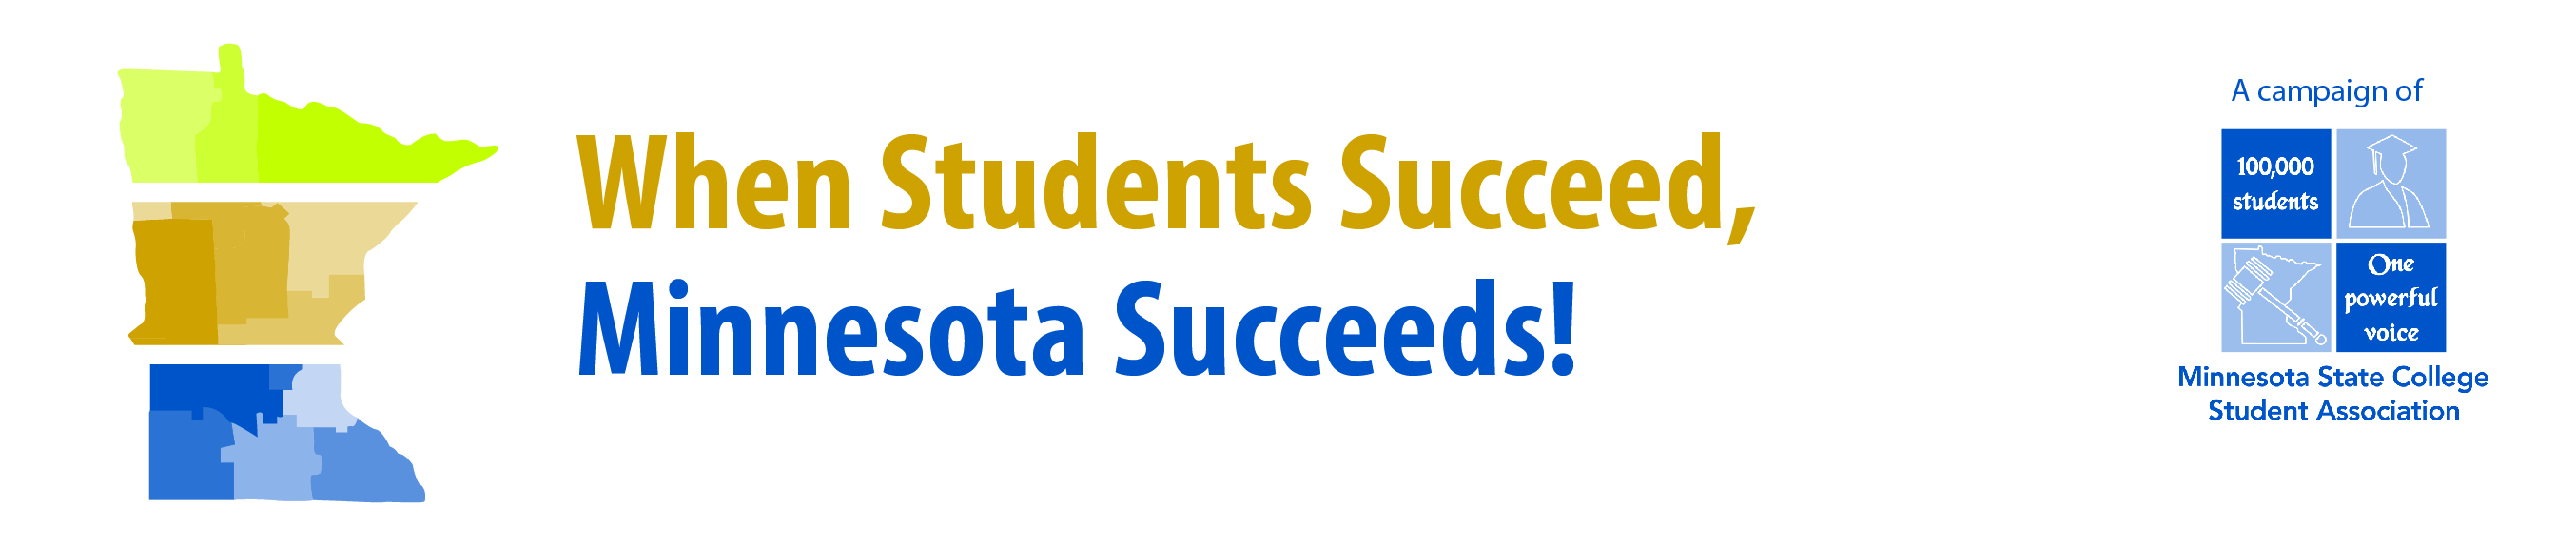 Minnesota State College Student Association